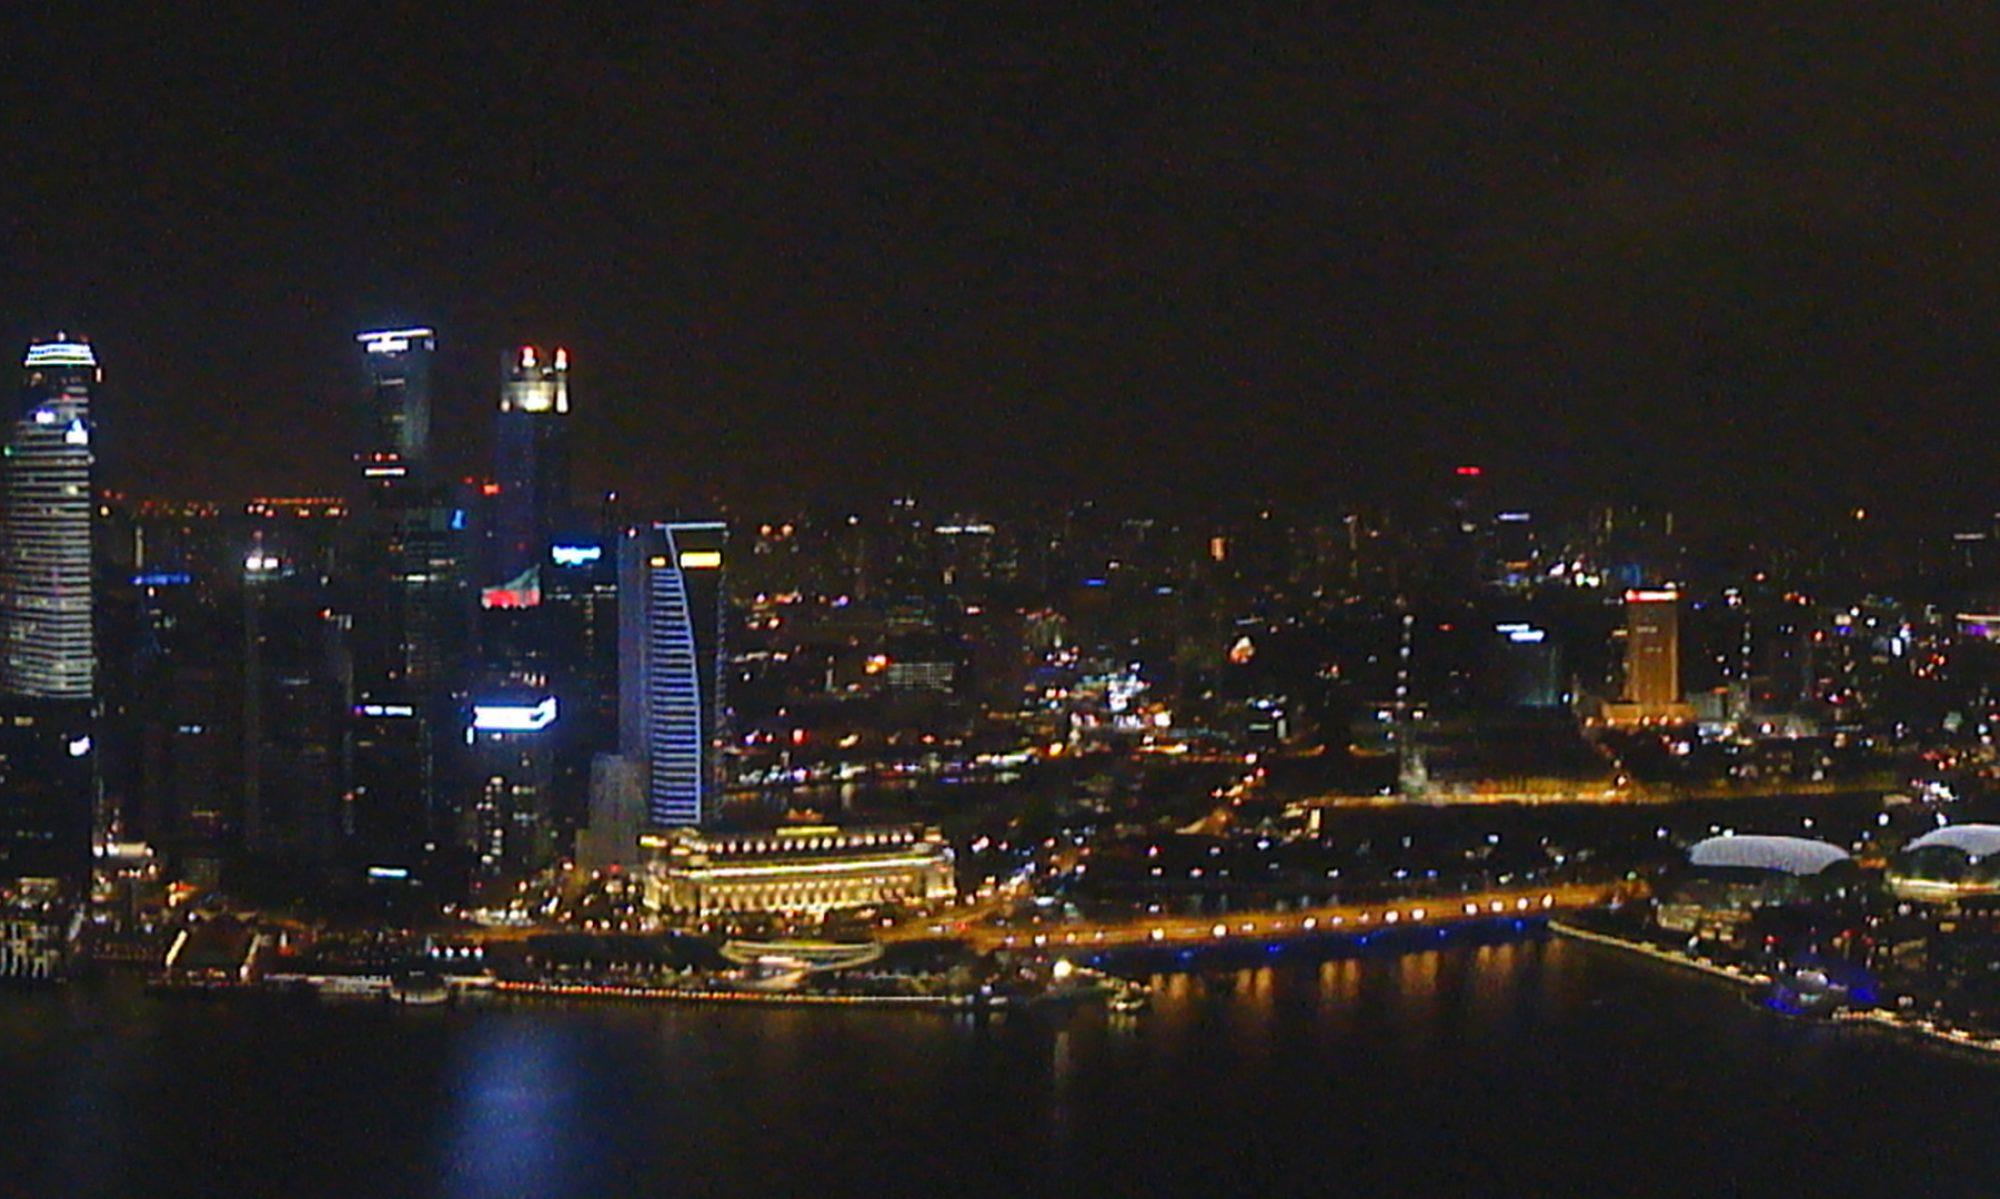 Singapore Night Shot